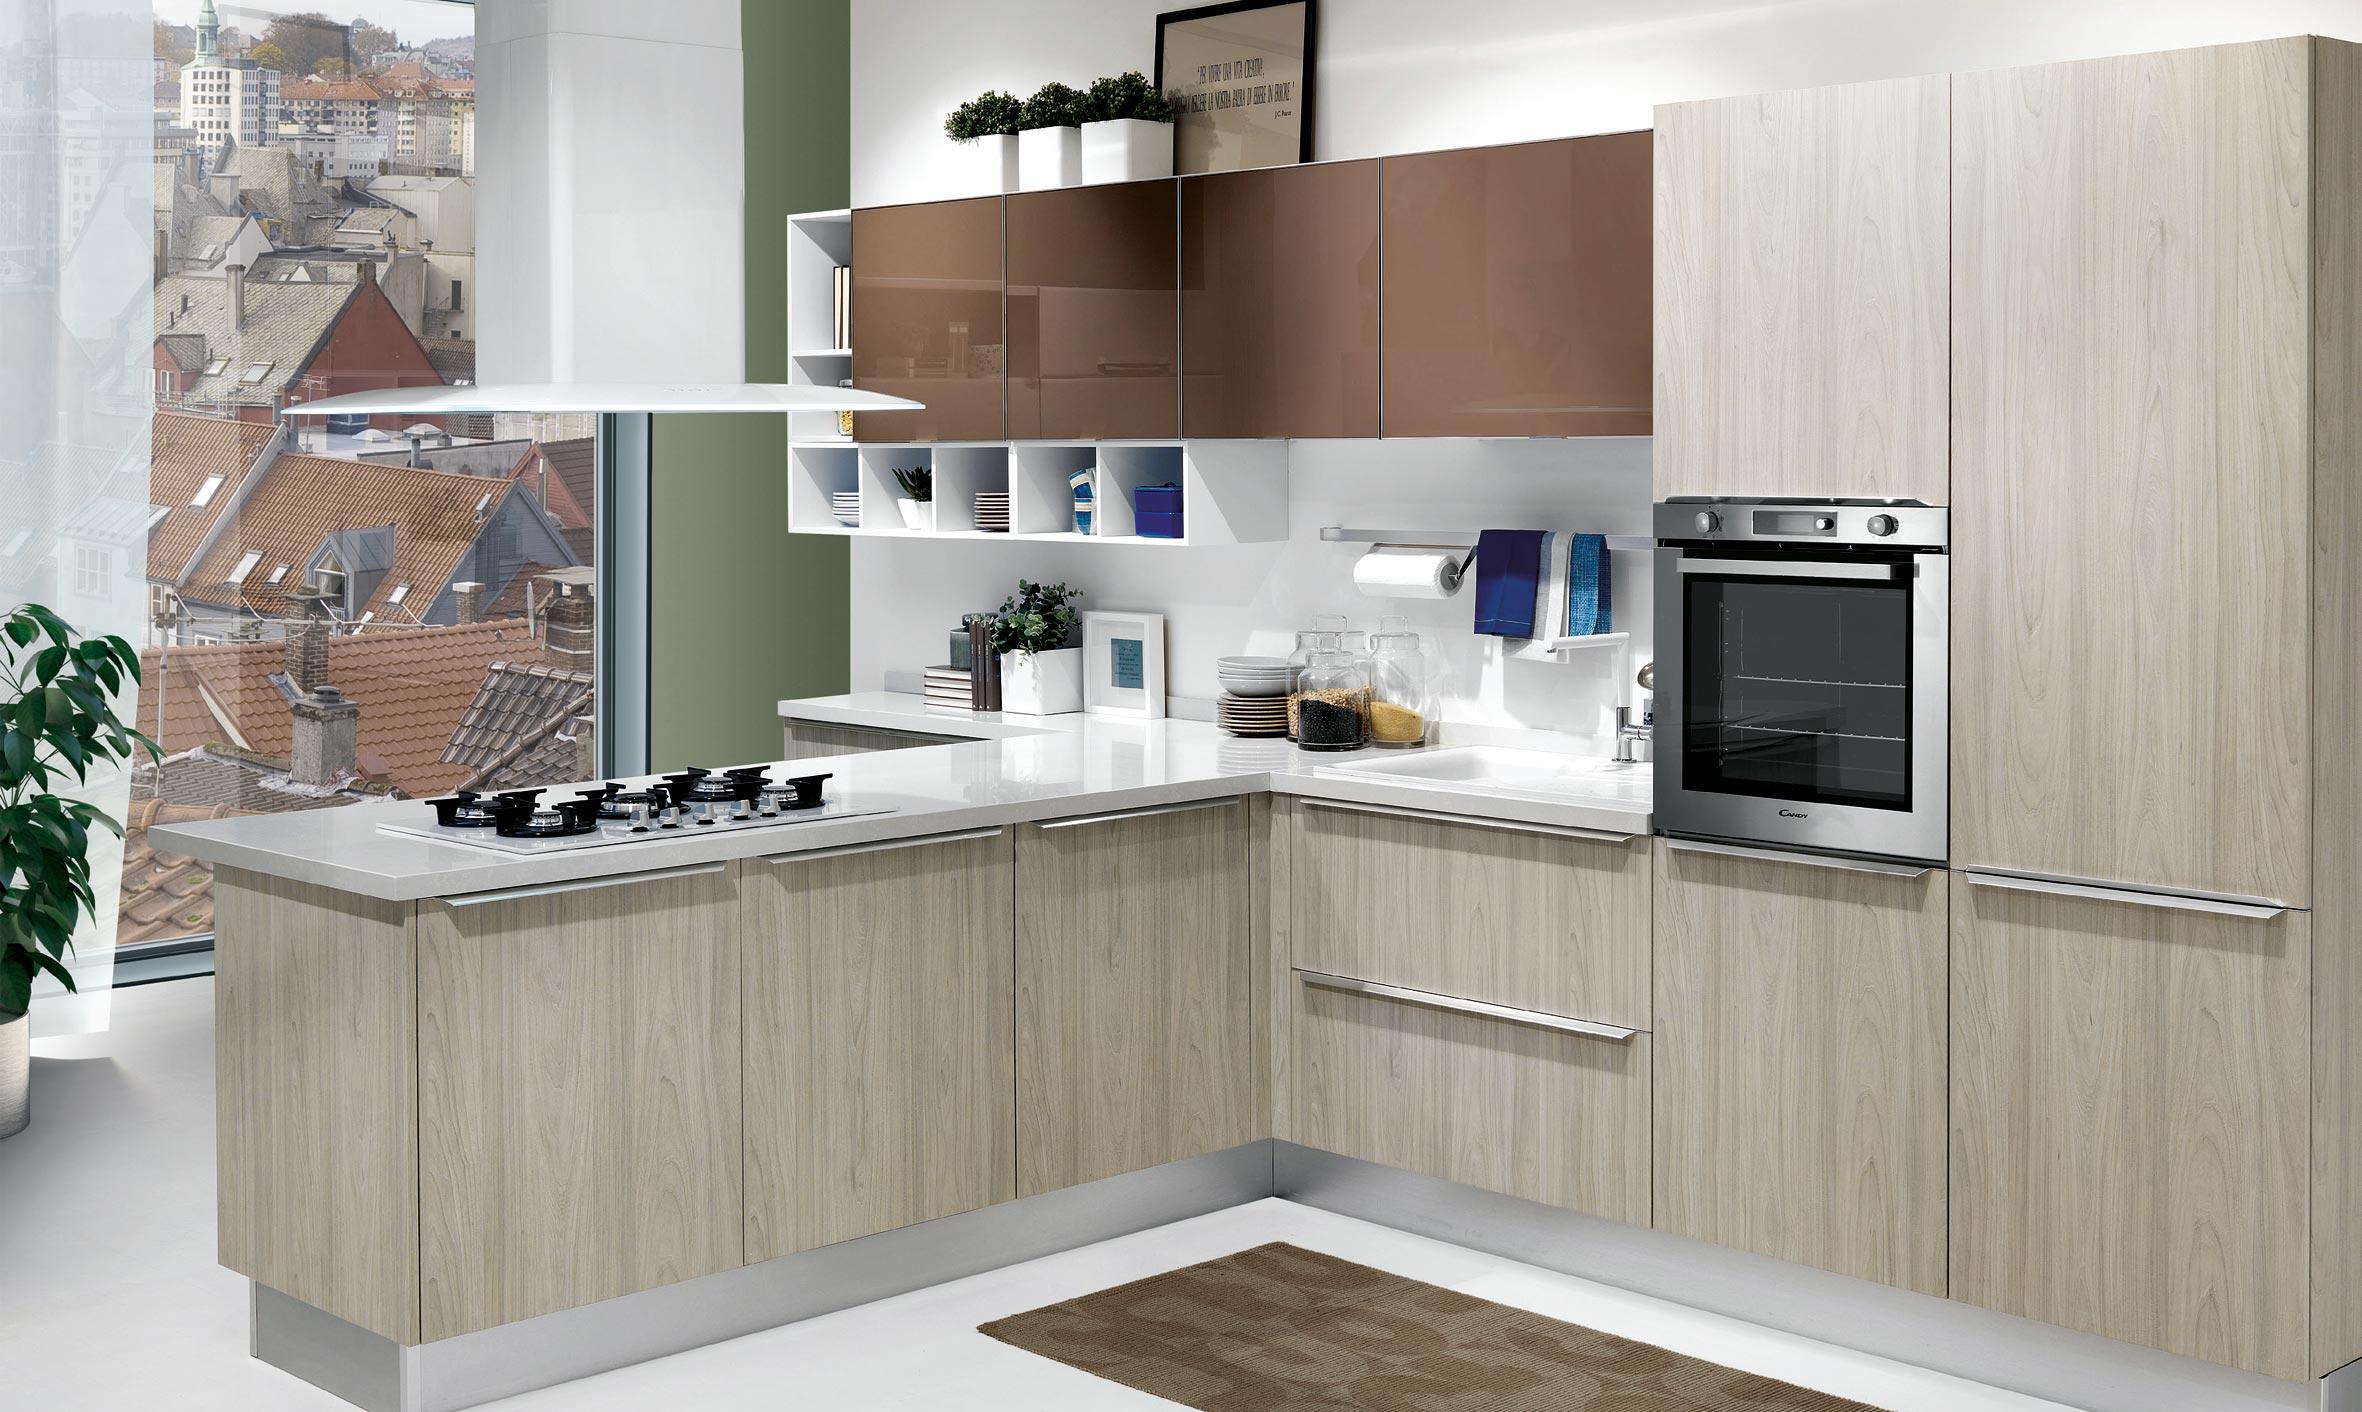 cucina moderna creo